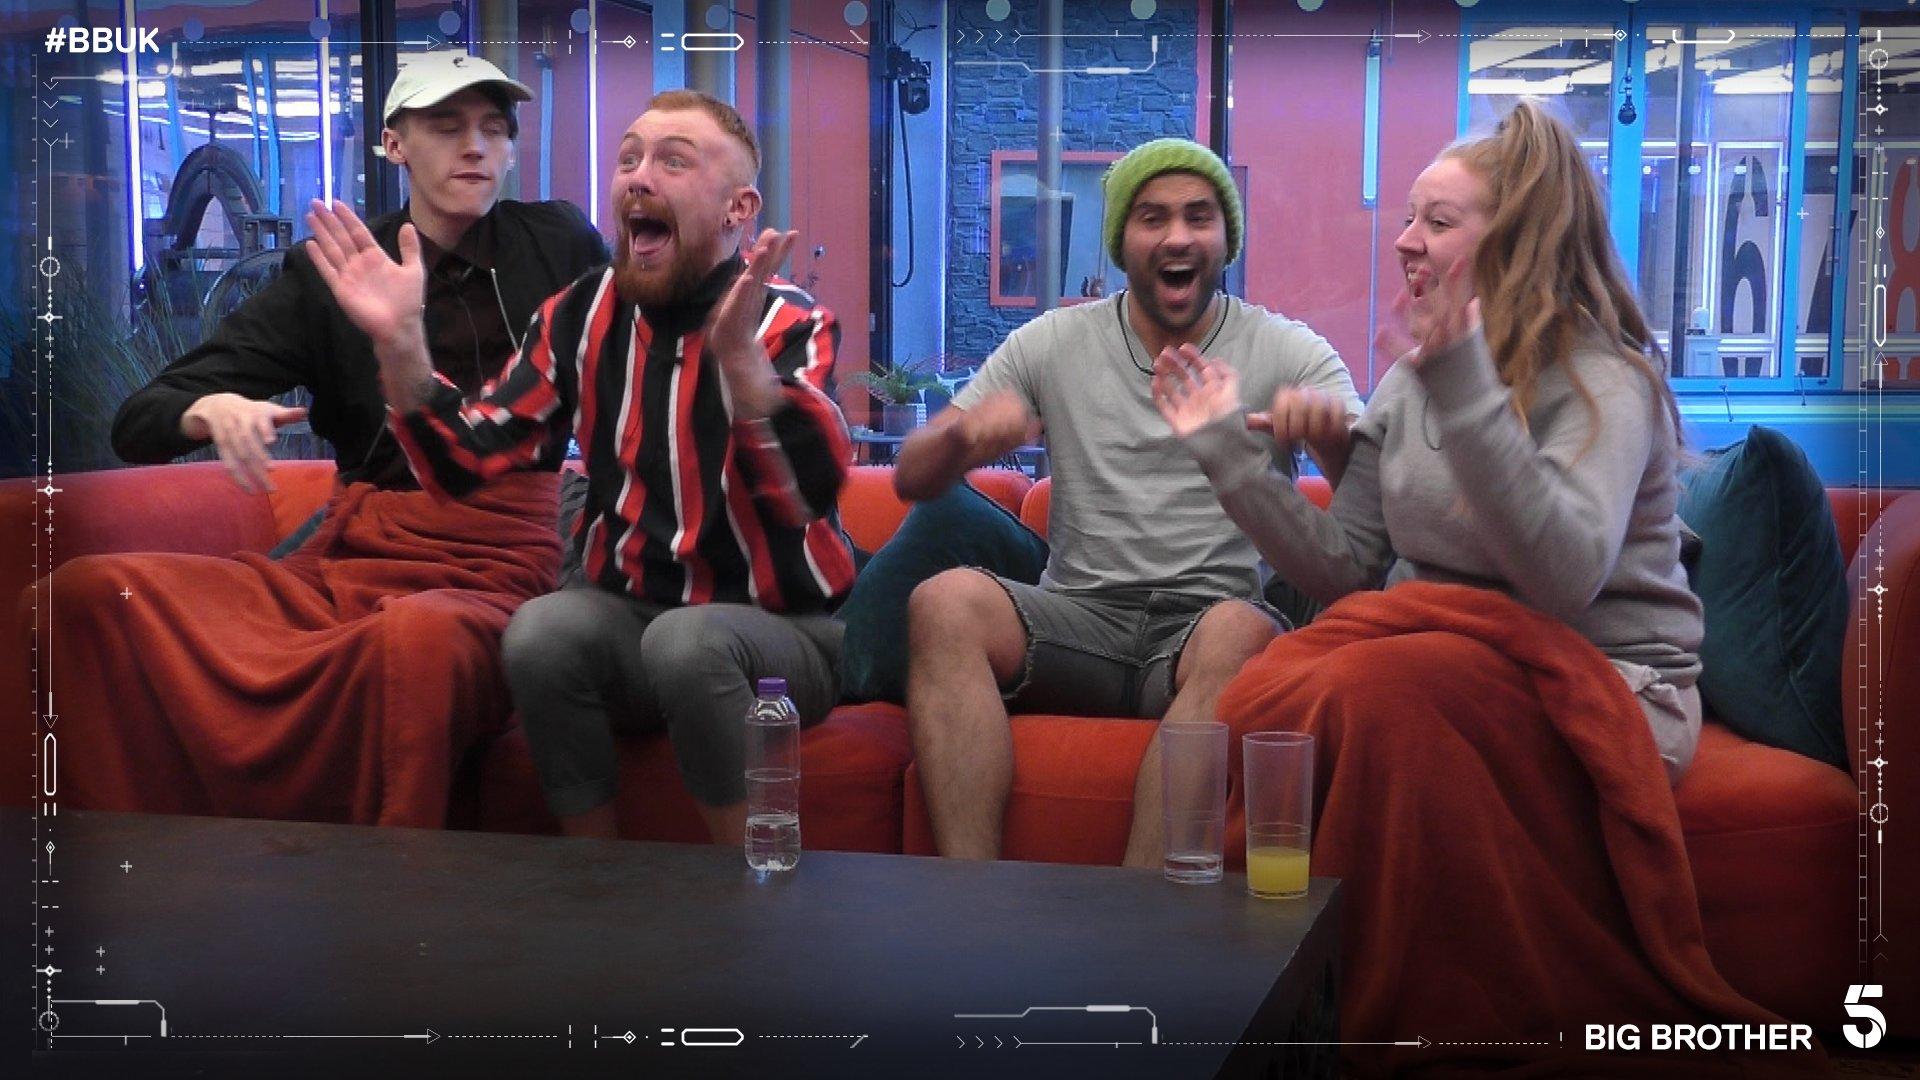 Big Brother UK - Twitter Tweet - Missed last night's